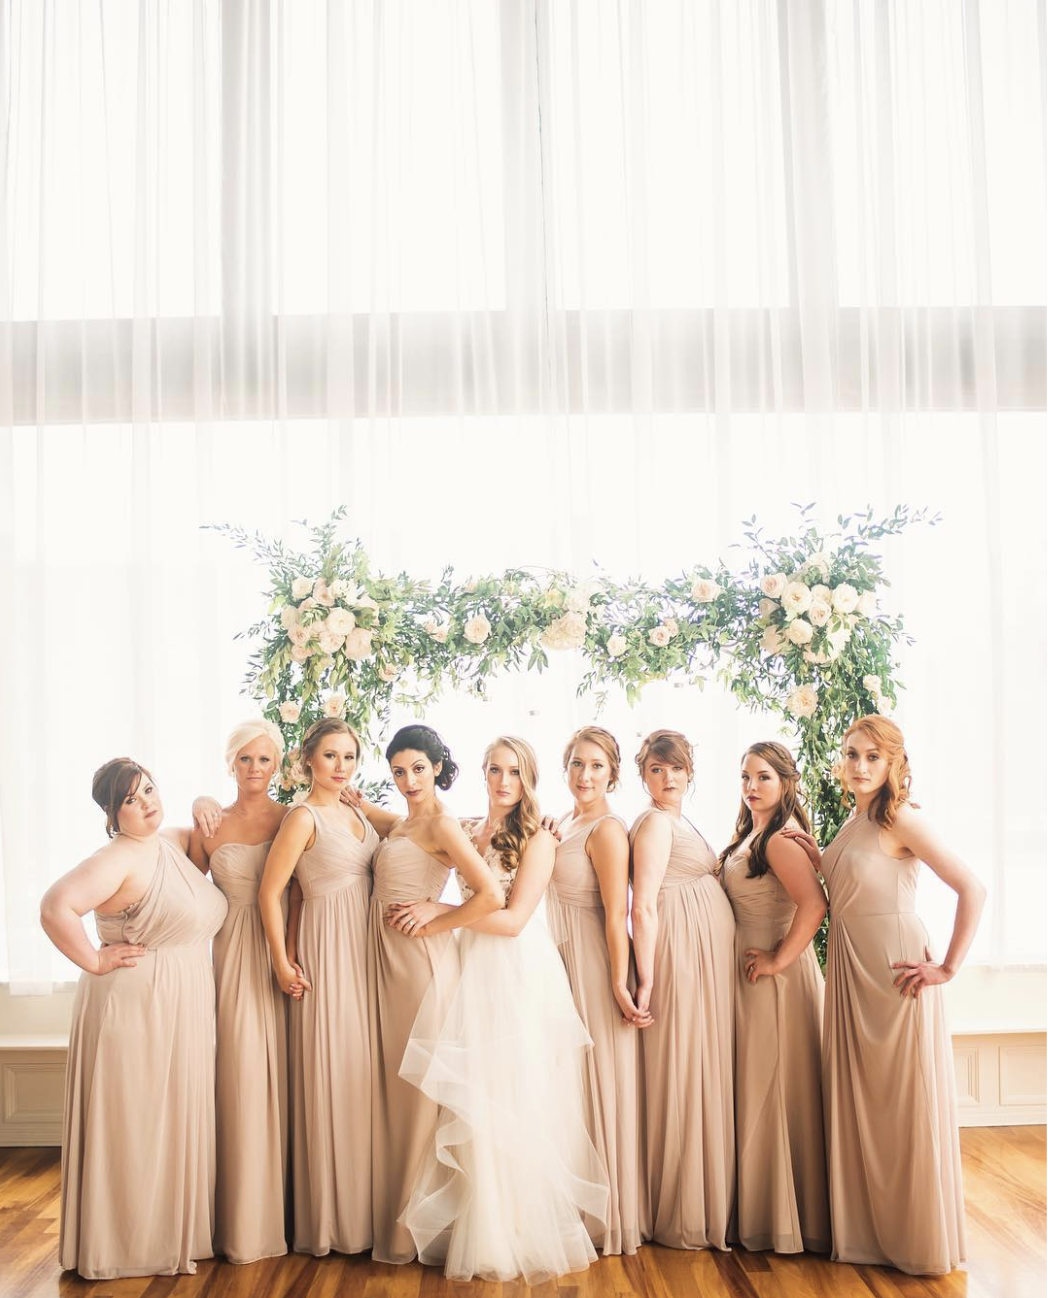 Saint Louis Mo Wedding Venue: Lumen Private Event Space